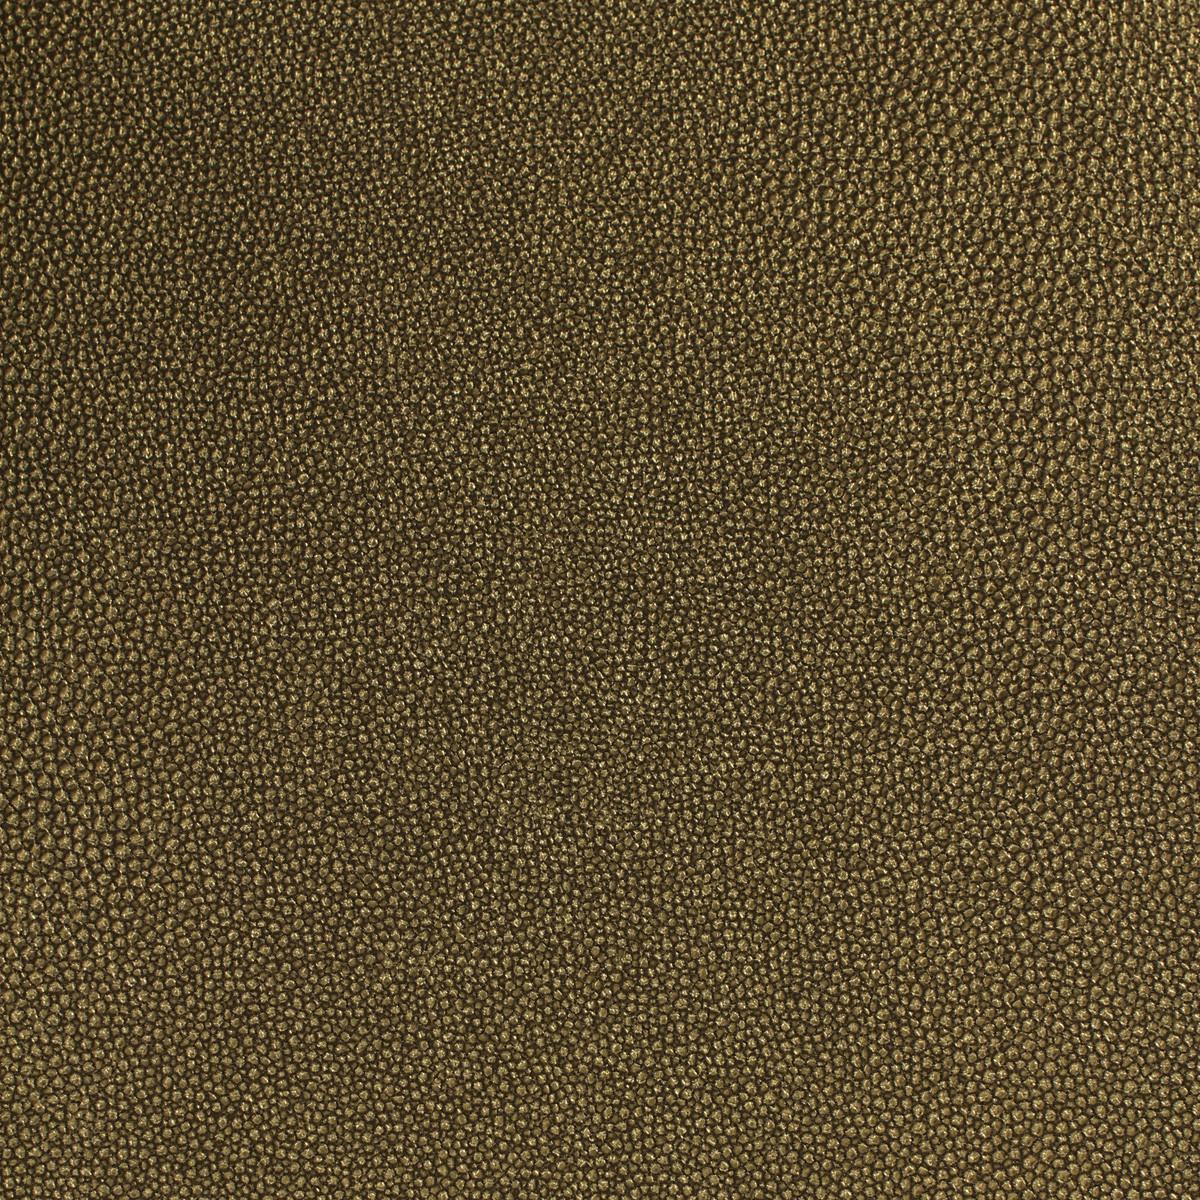 Wallpaper Gloockler Plain Design Brown Gold Metallic 52562